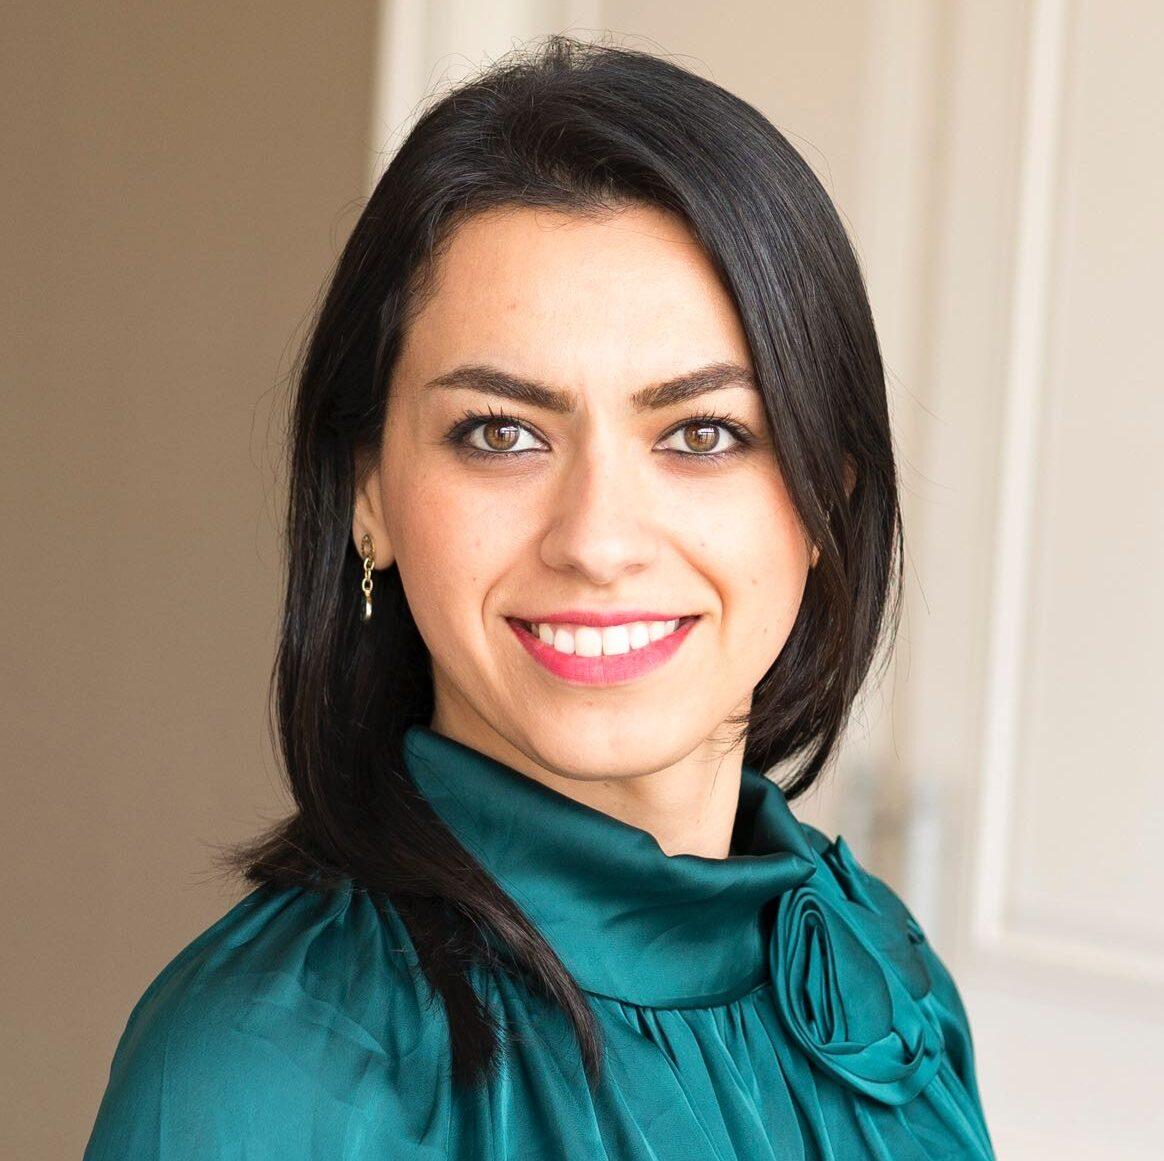 Dr. Sahar Vahdati